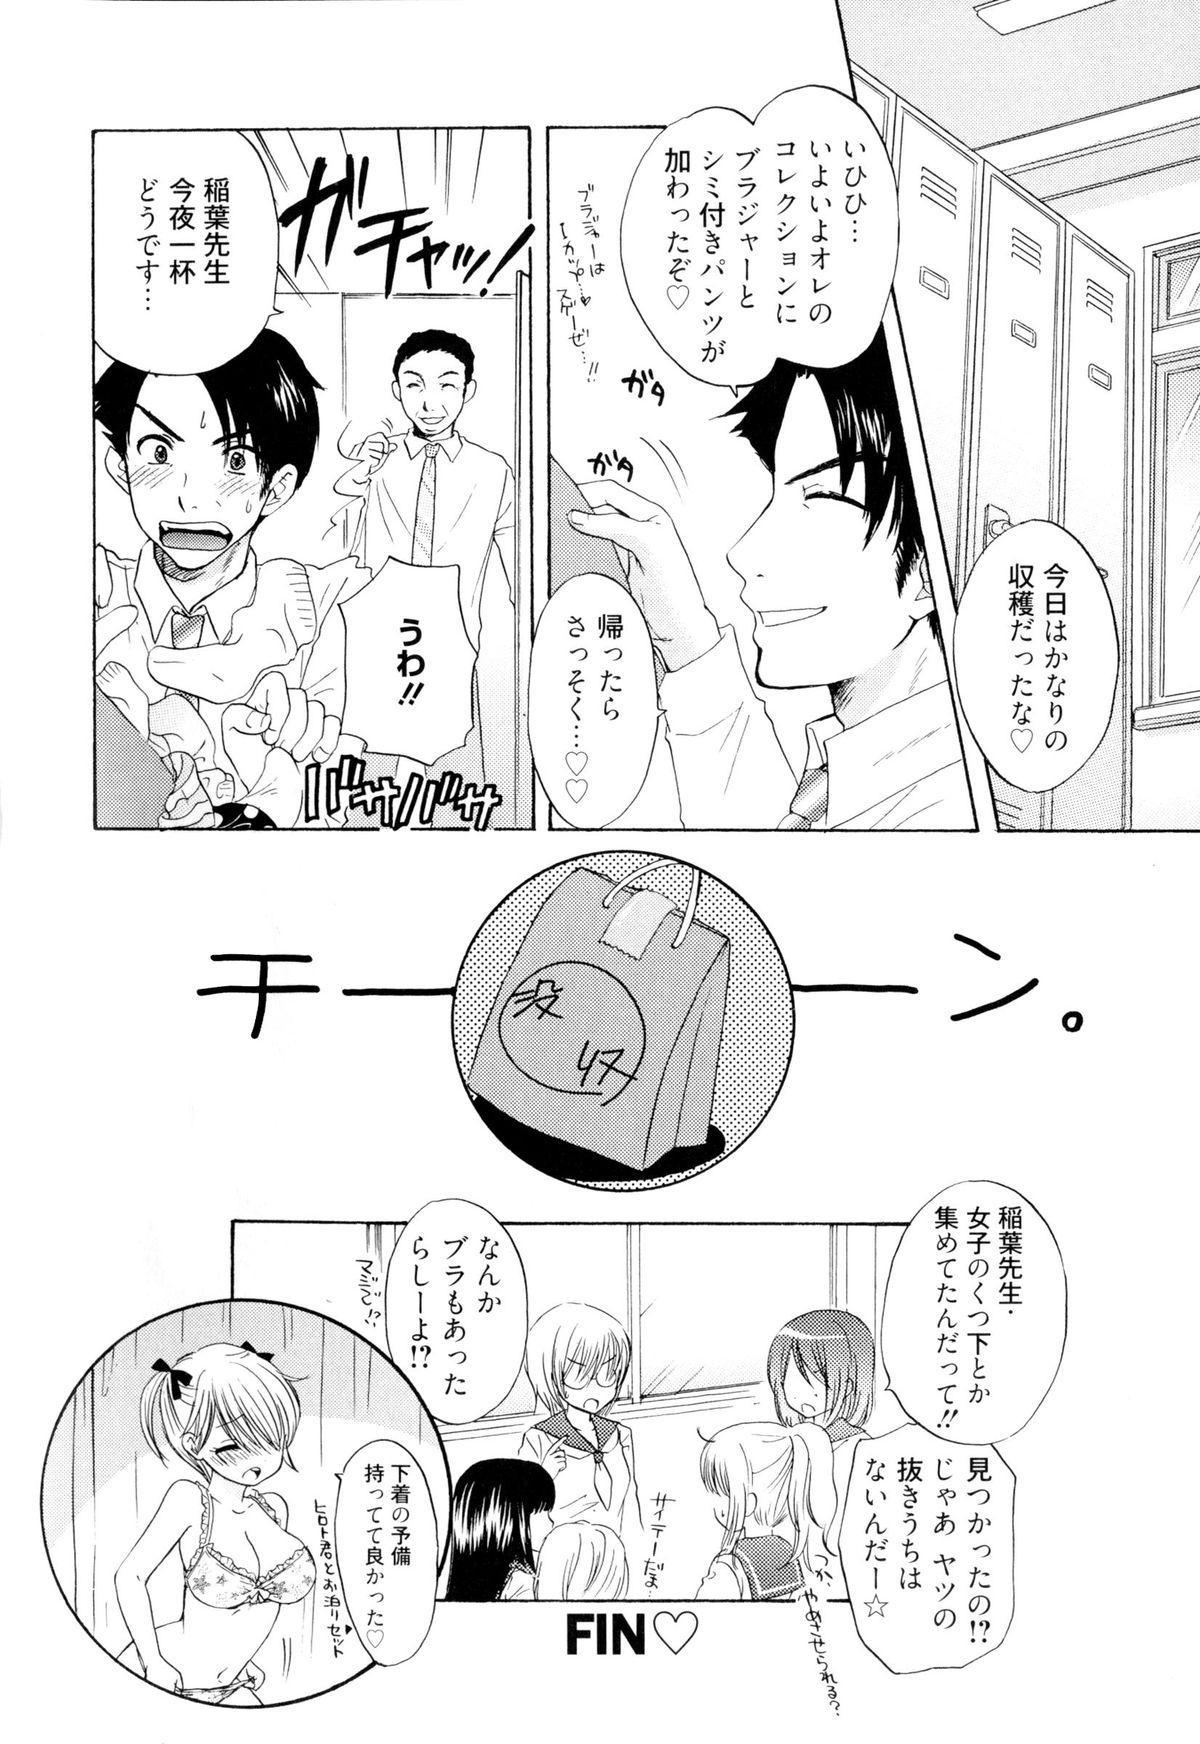 The Great Escape 4 Shokai Genteiban 19